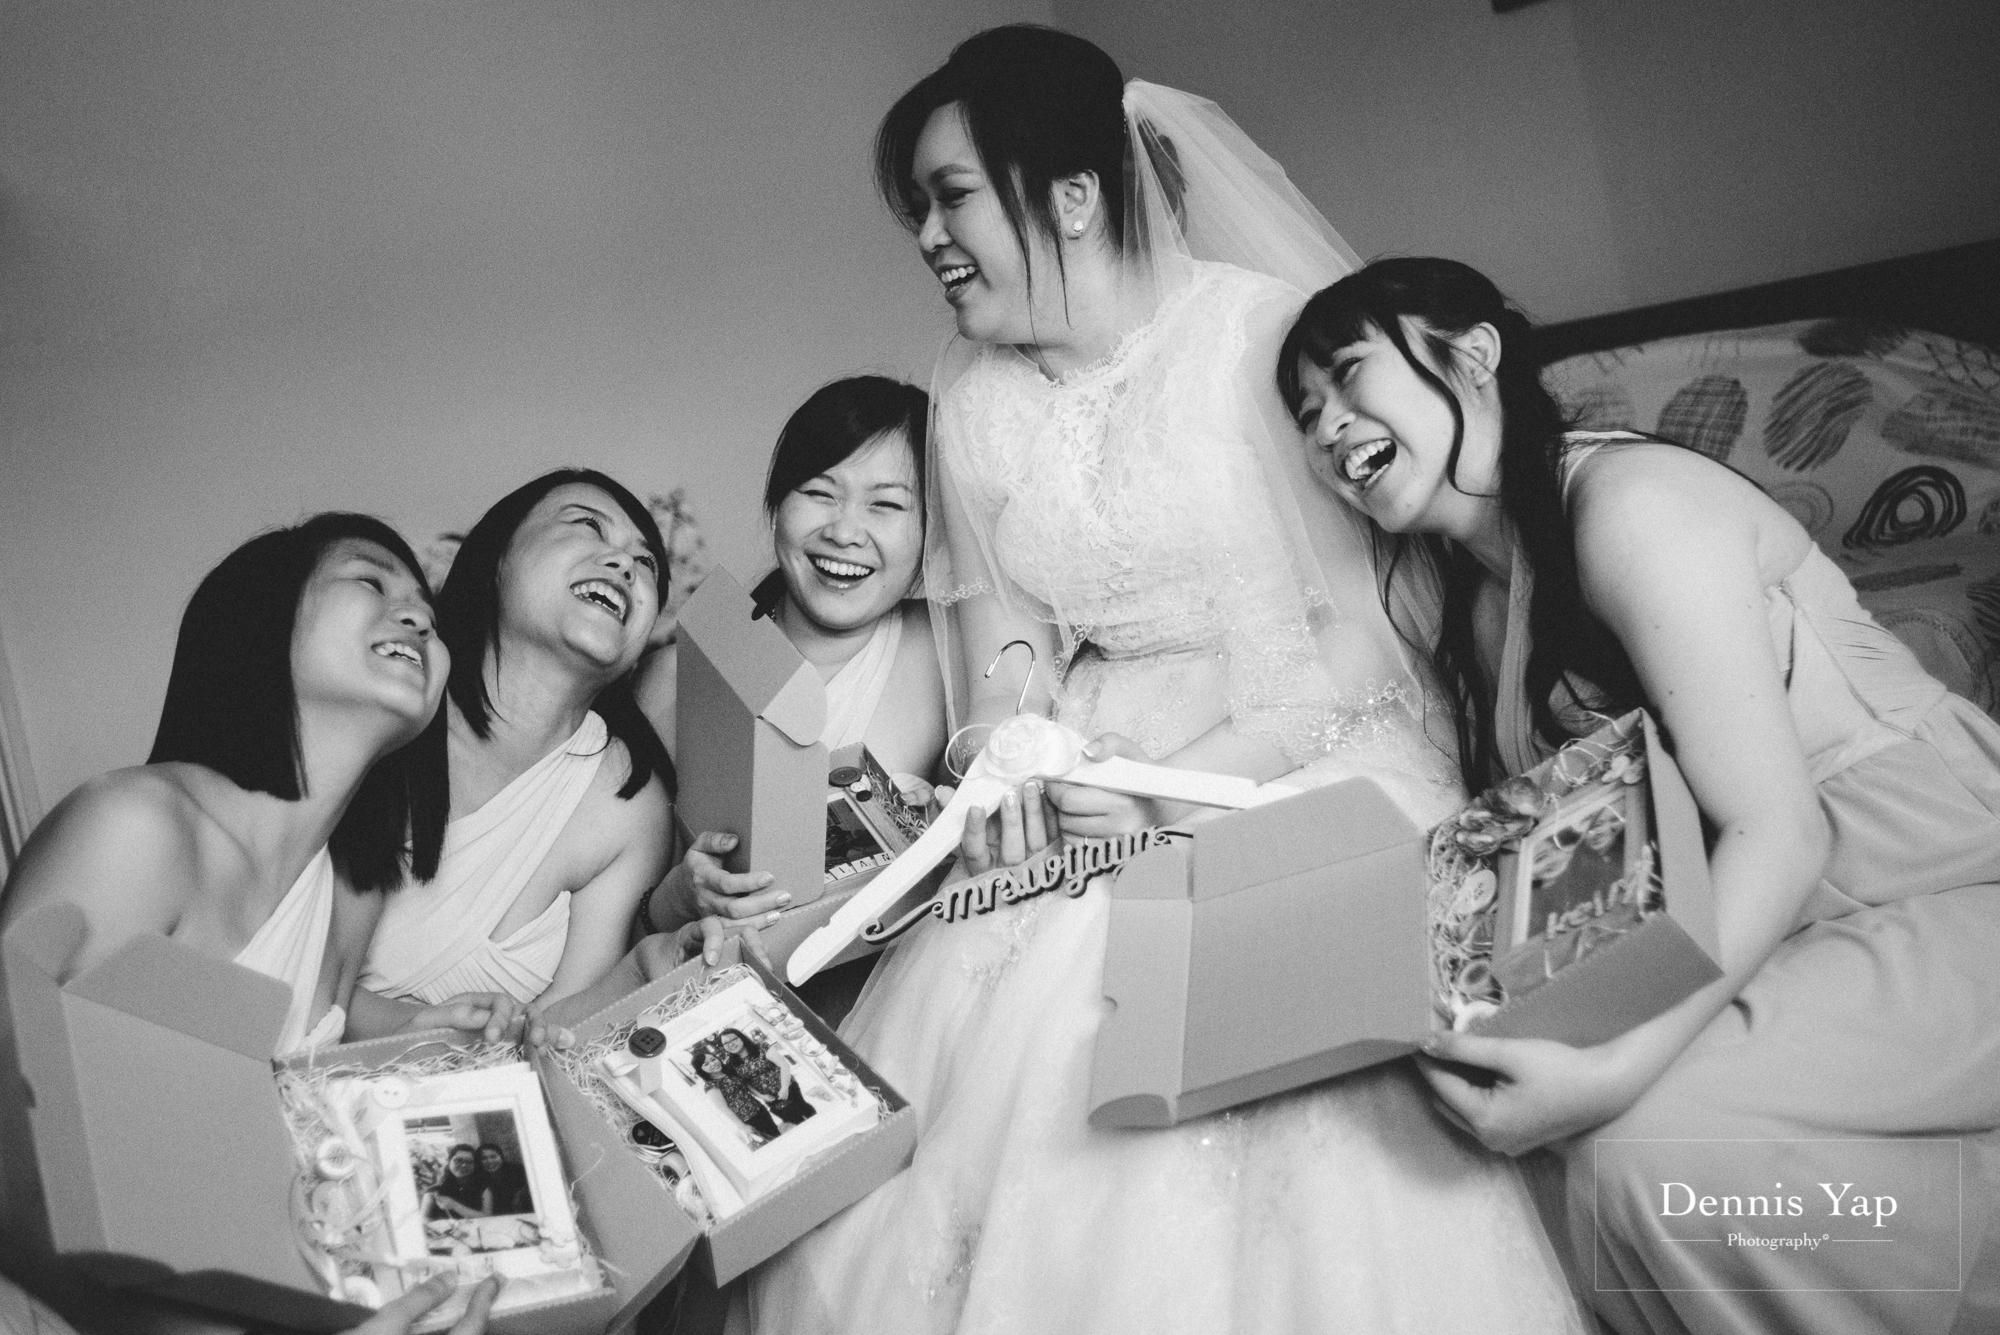 ino sheri black white church wedding st thomas more subang jaya dennis yap photography touching love beloved australia indonesia-3.jpg